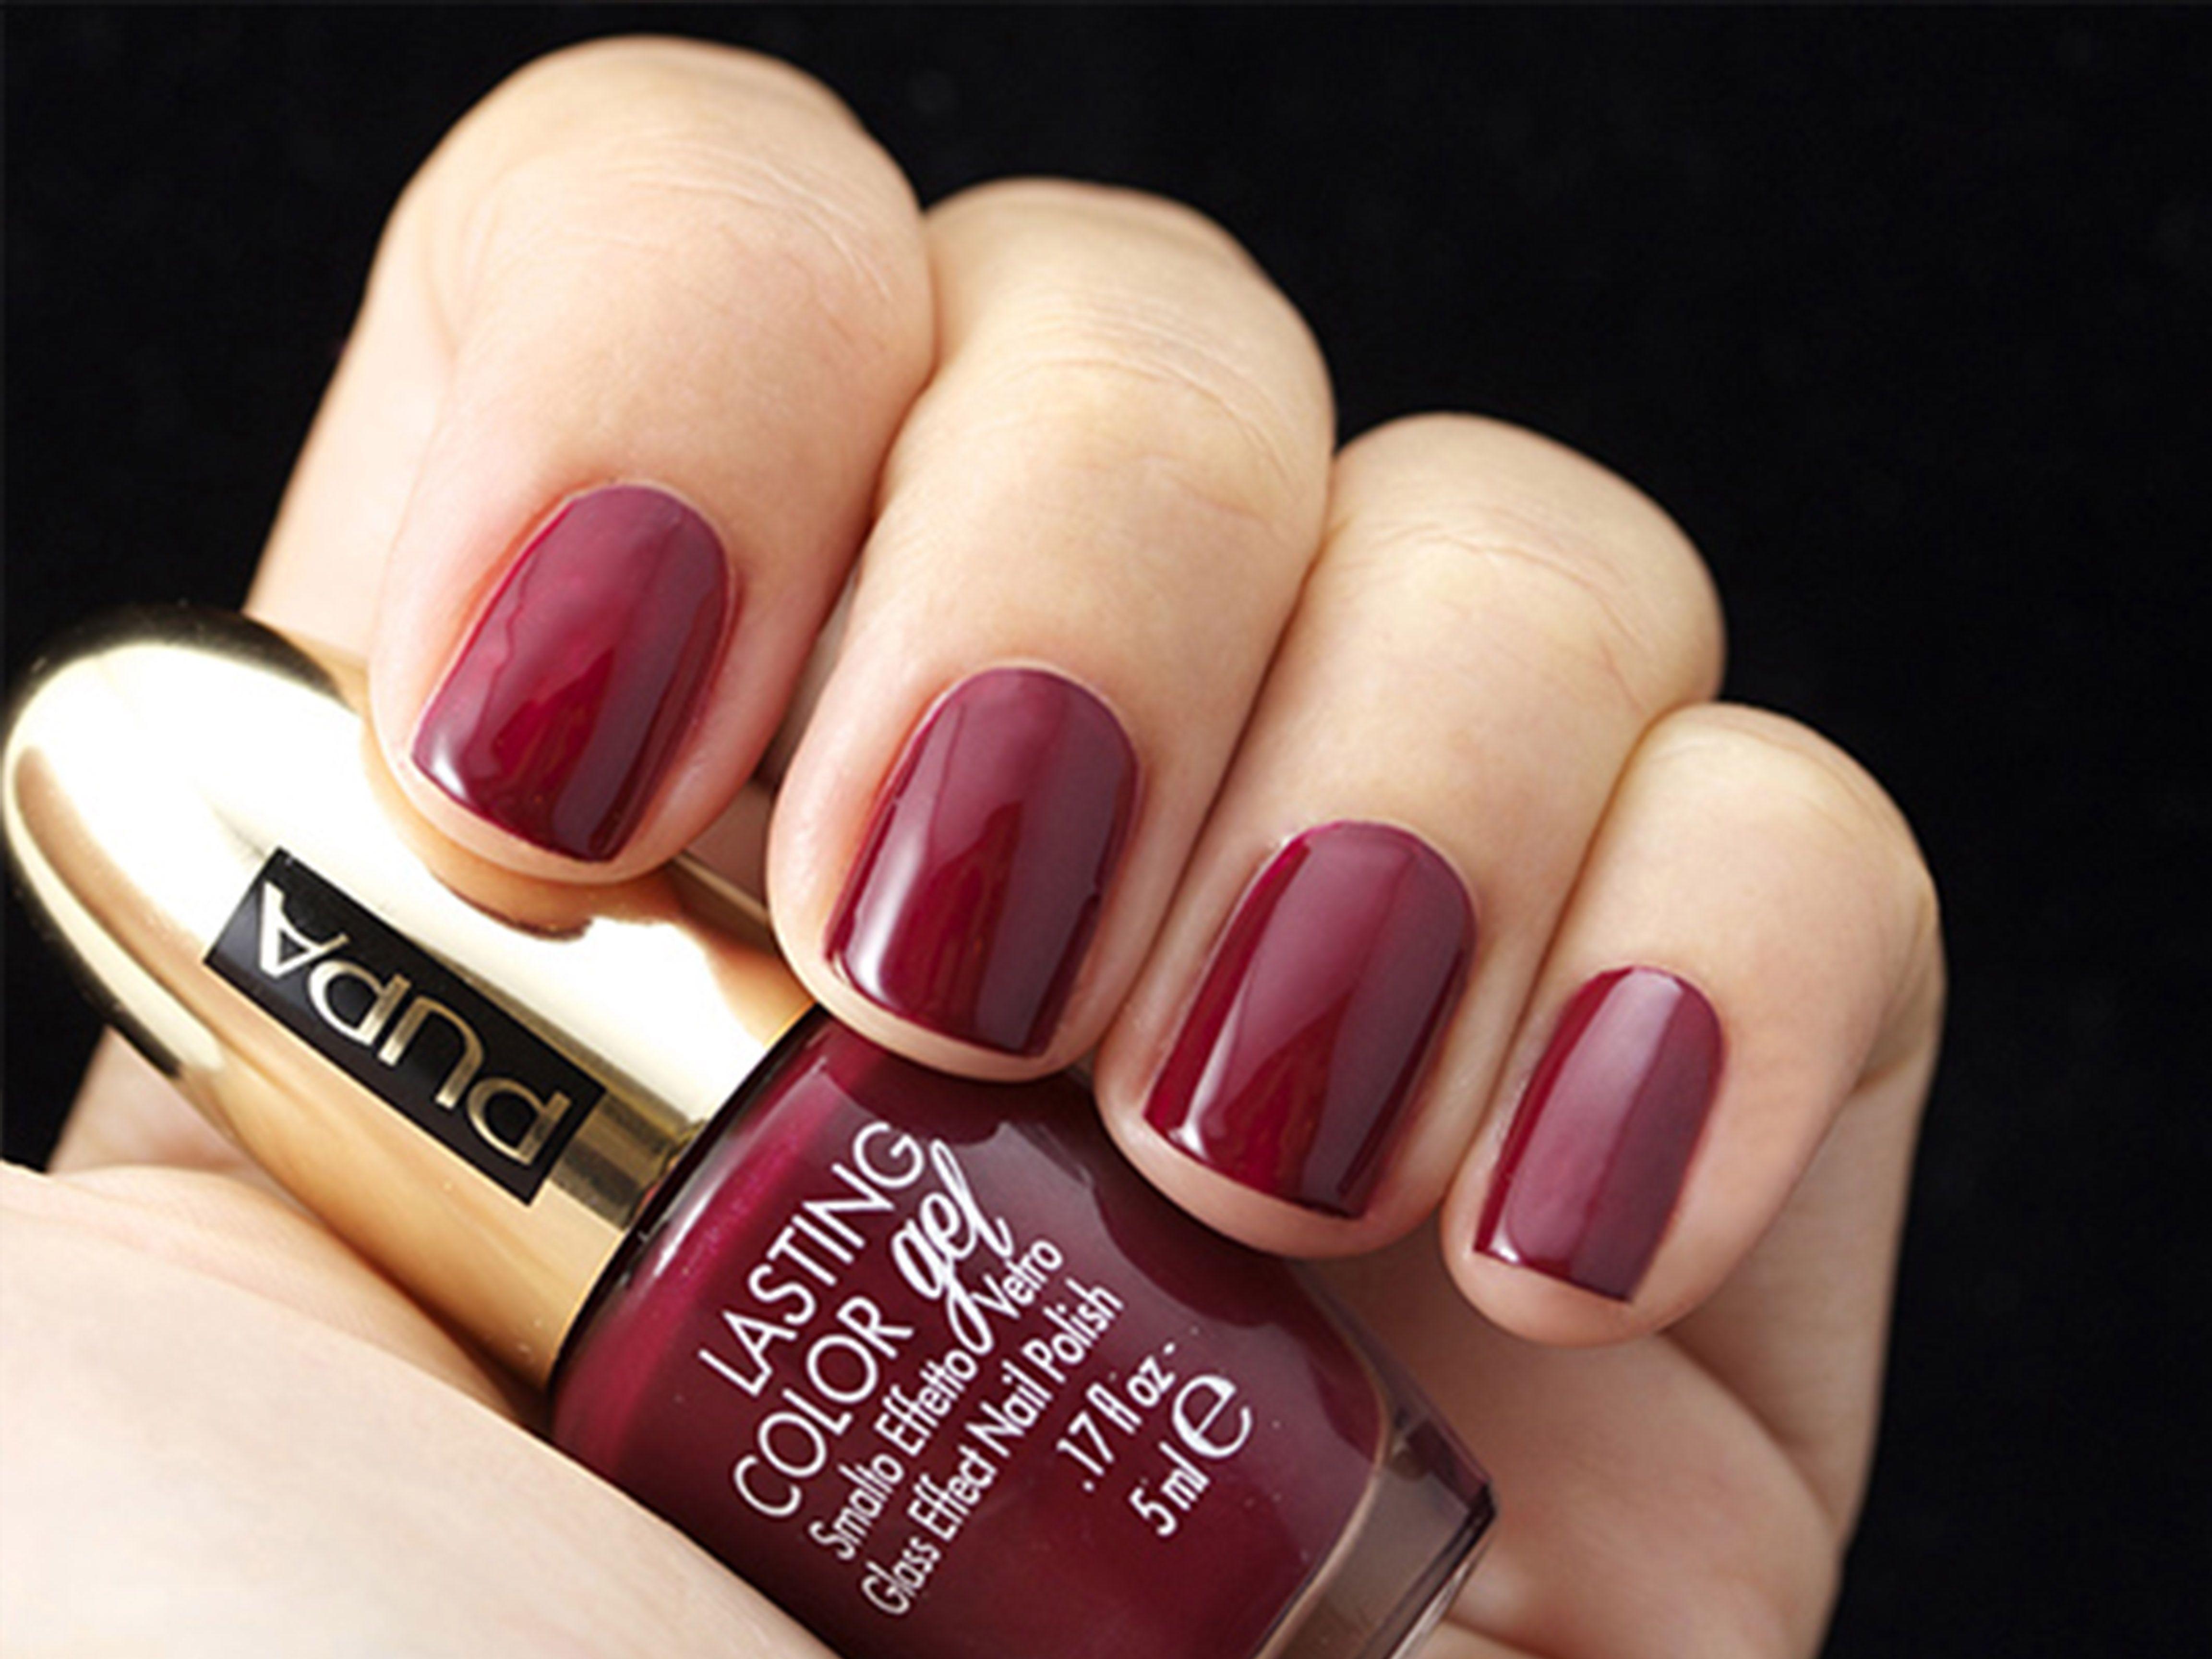 StayGold #nails #nailpolish #lastingcolorgel 134 Deep Burgundy ...